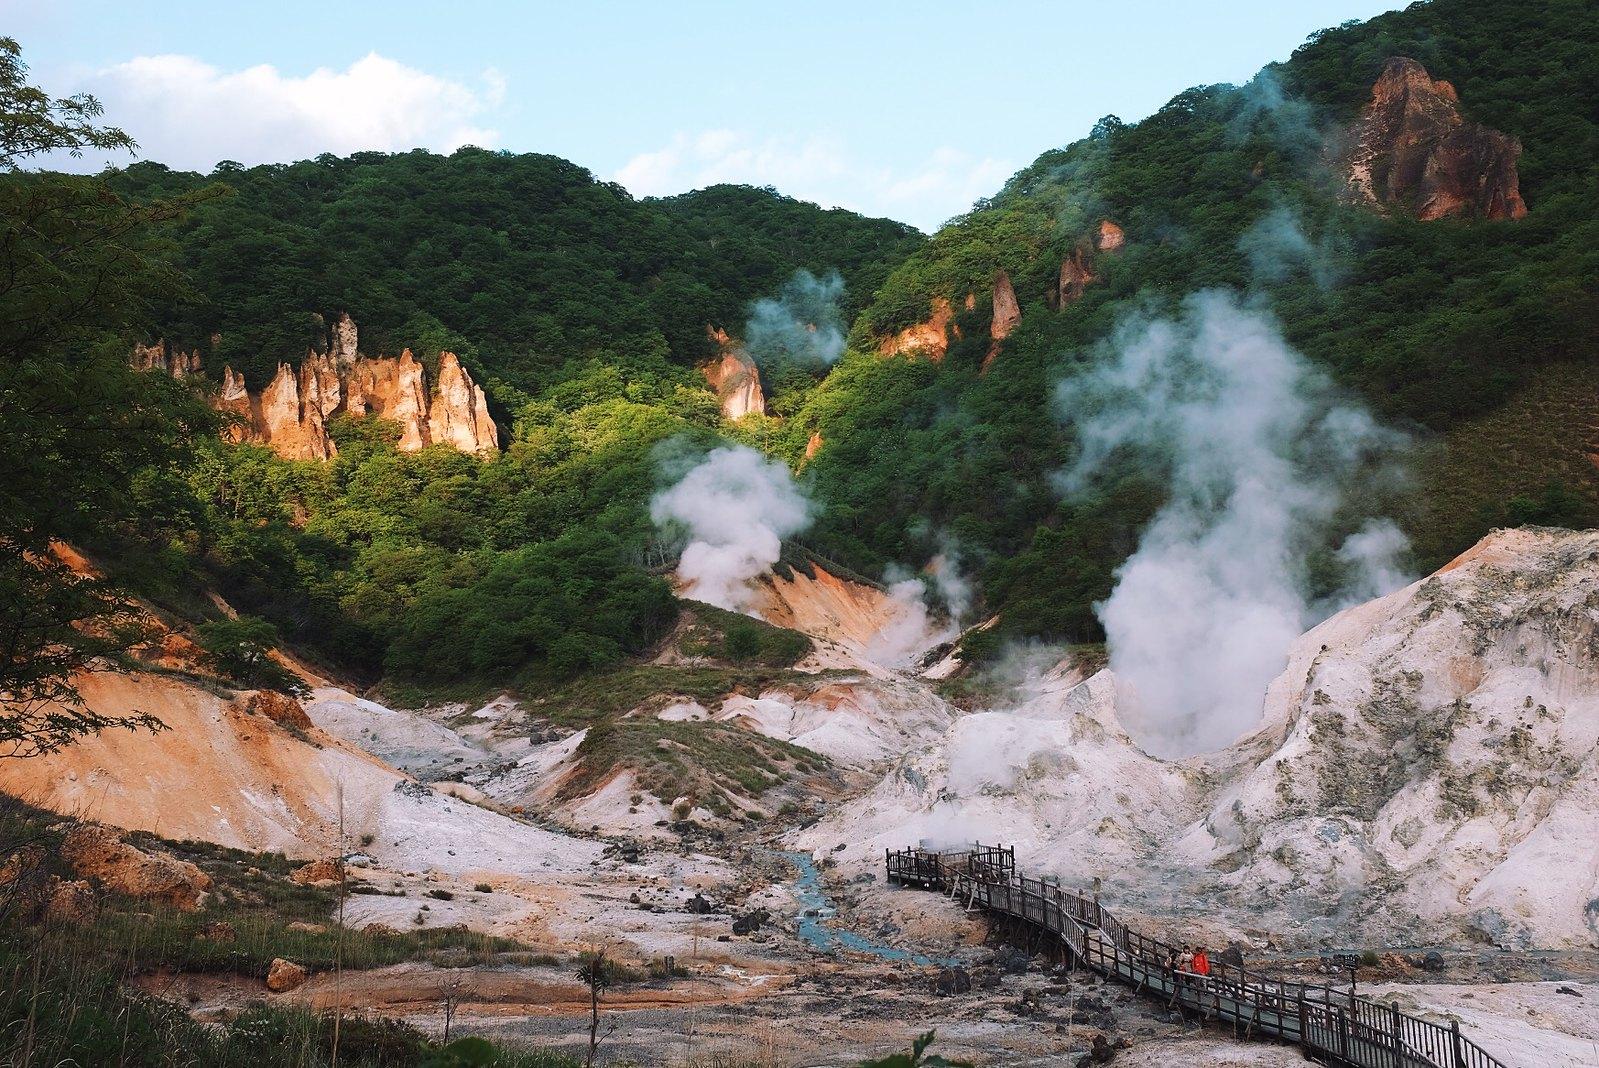 Jigokudani (Hell Valley) - Noboribetsu Onsen